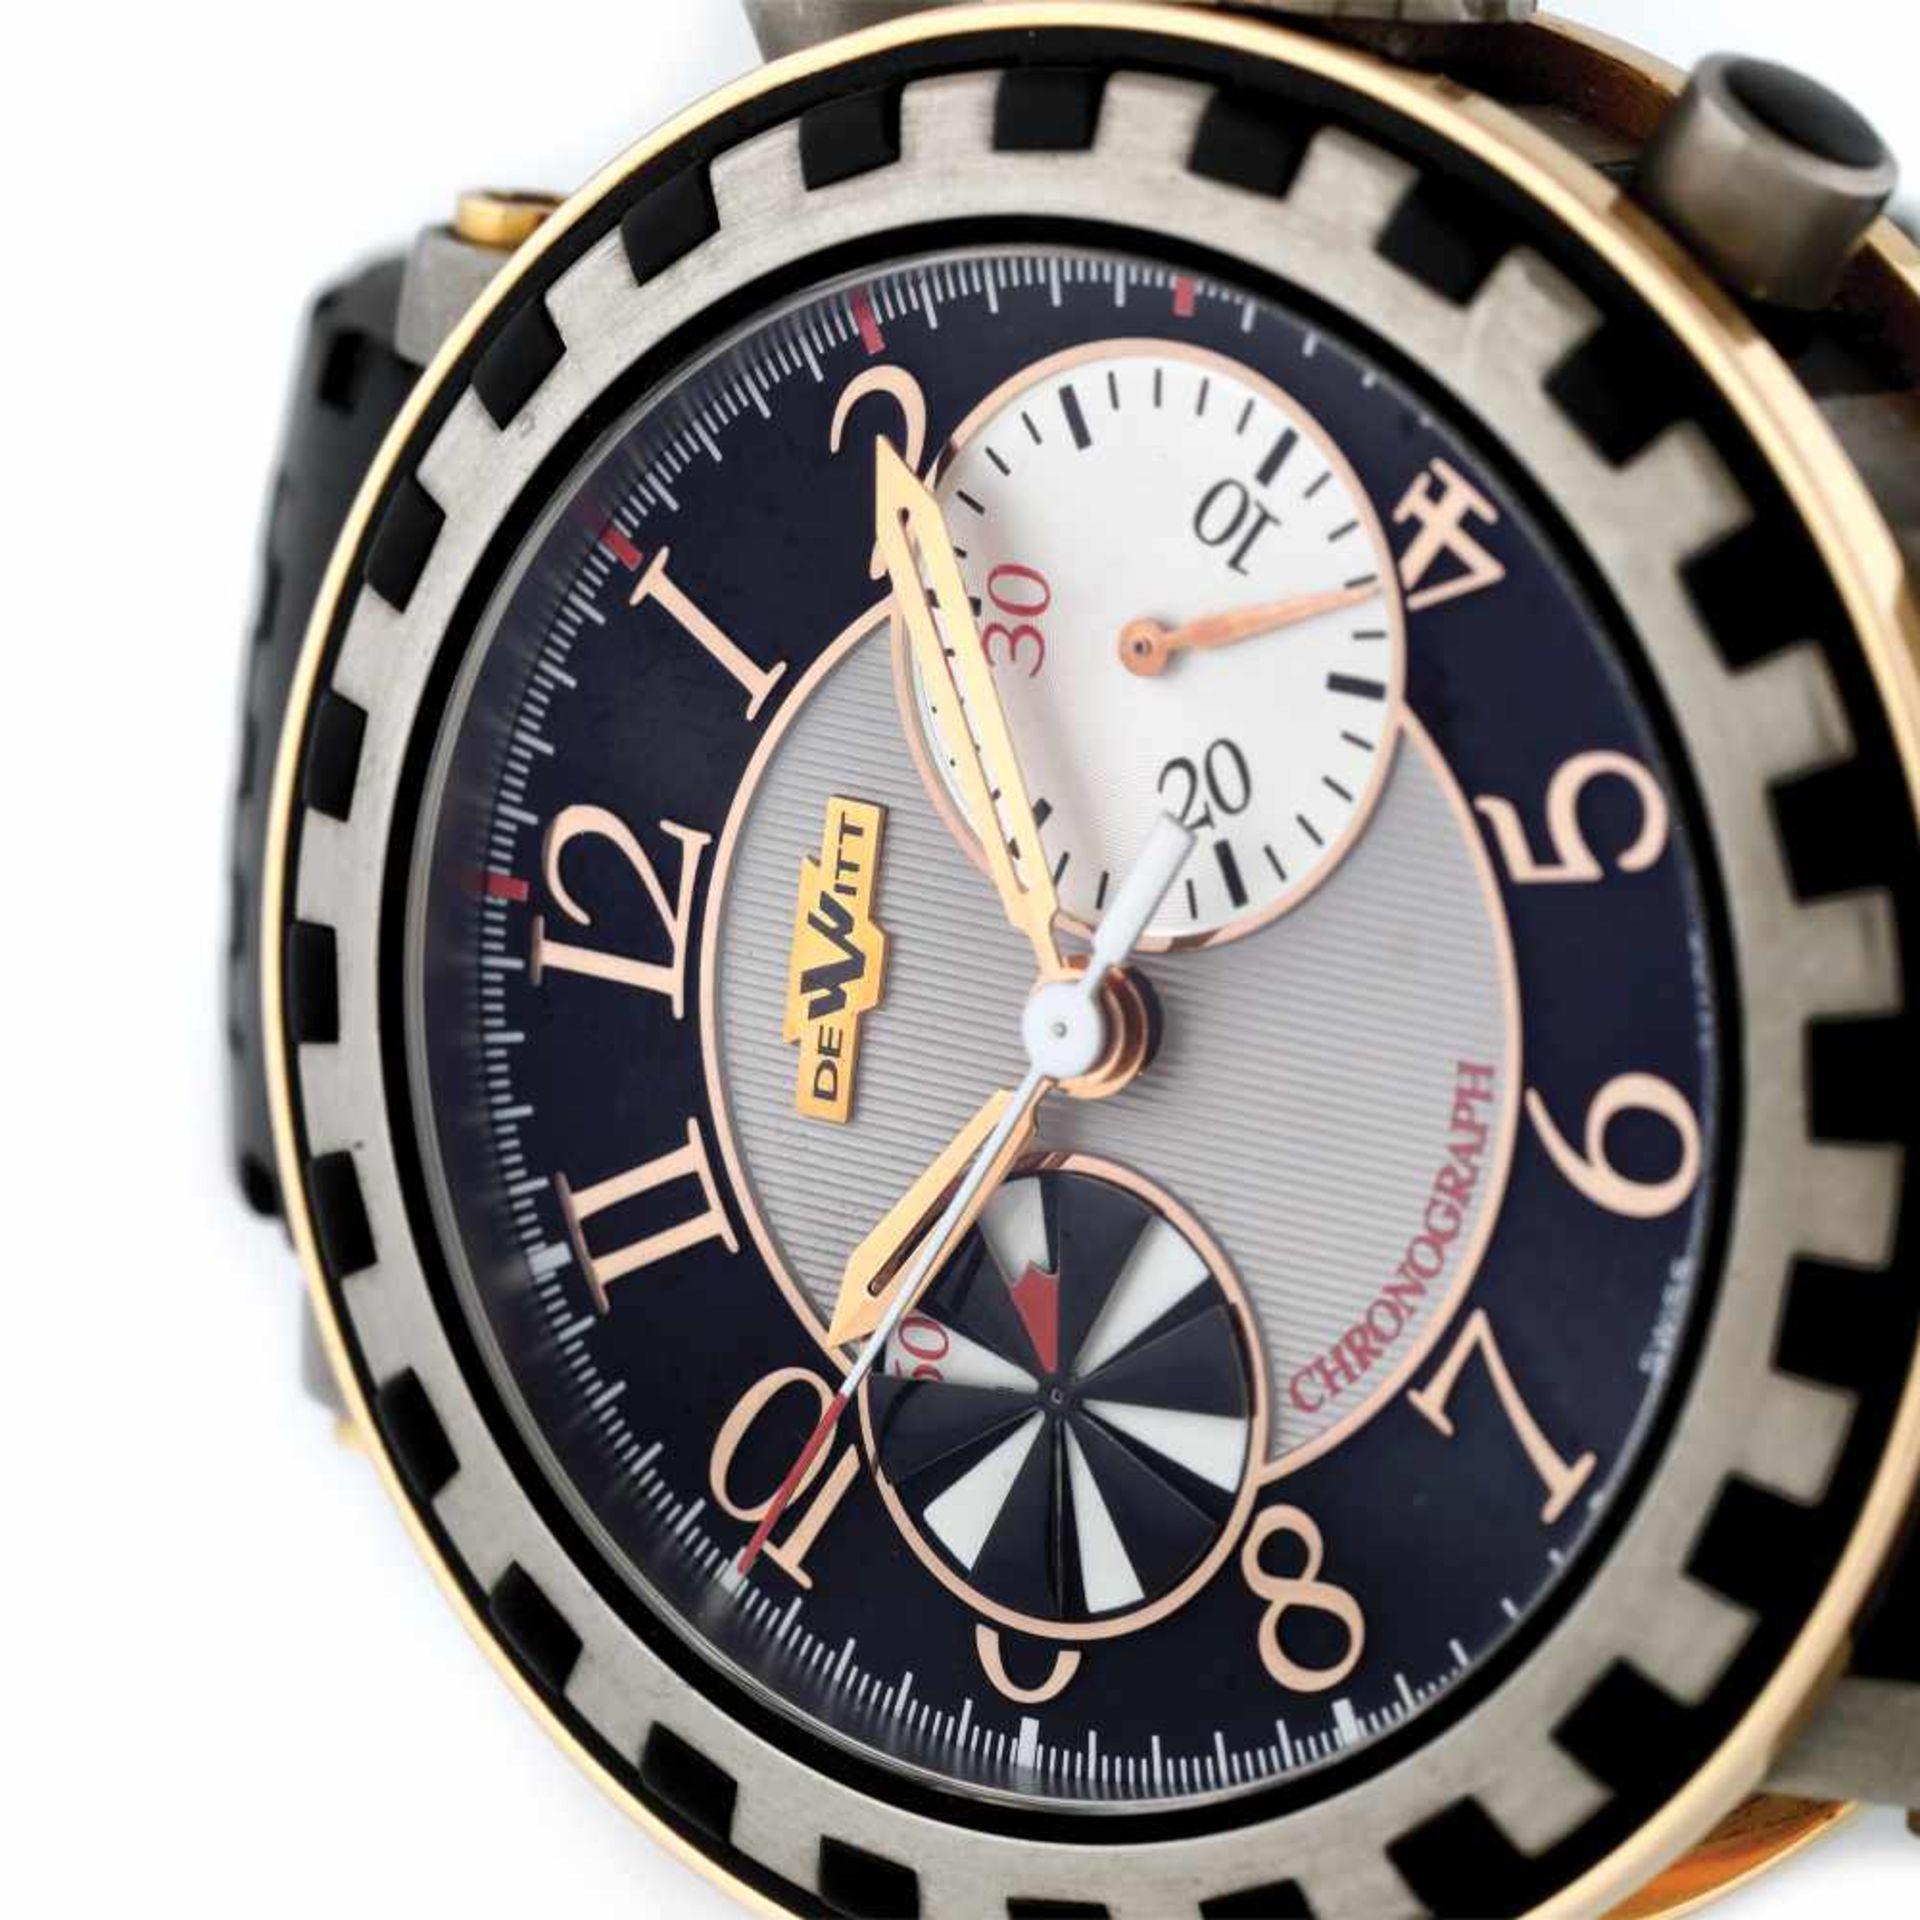 DeWitt Academia Chronographe wristwatch, titan and rose gold, men, limited edition 061/999 - Bild 3 aus 4